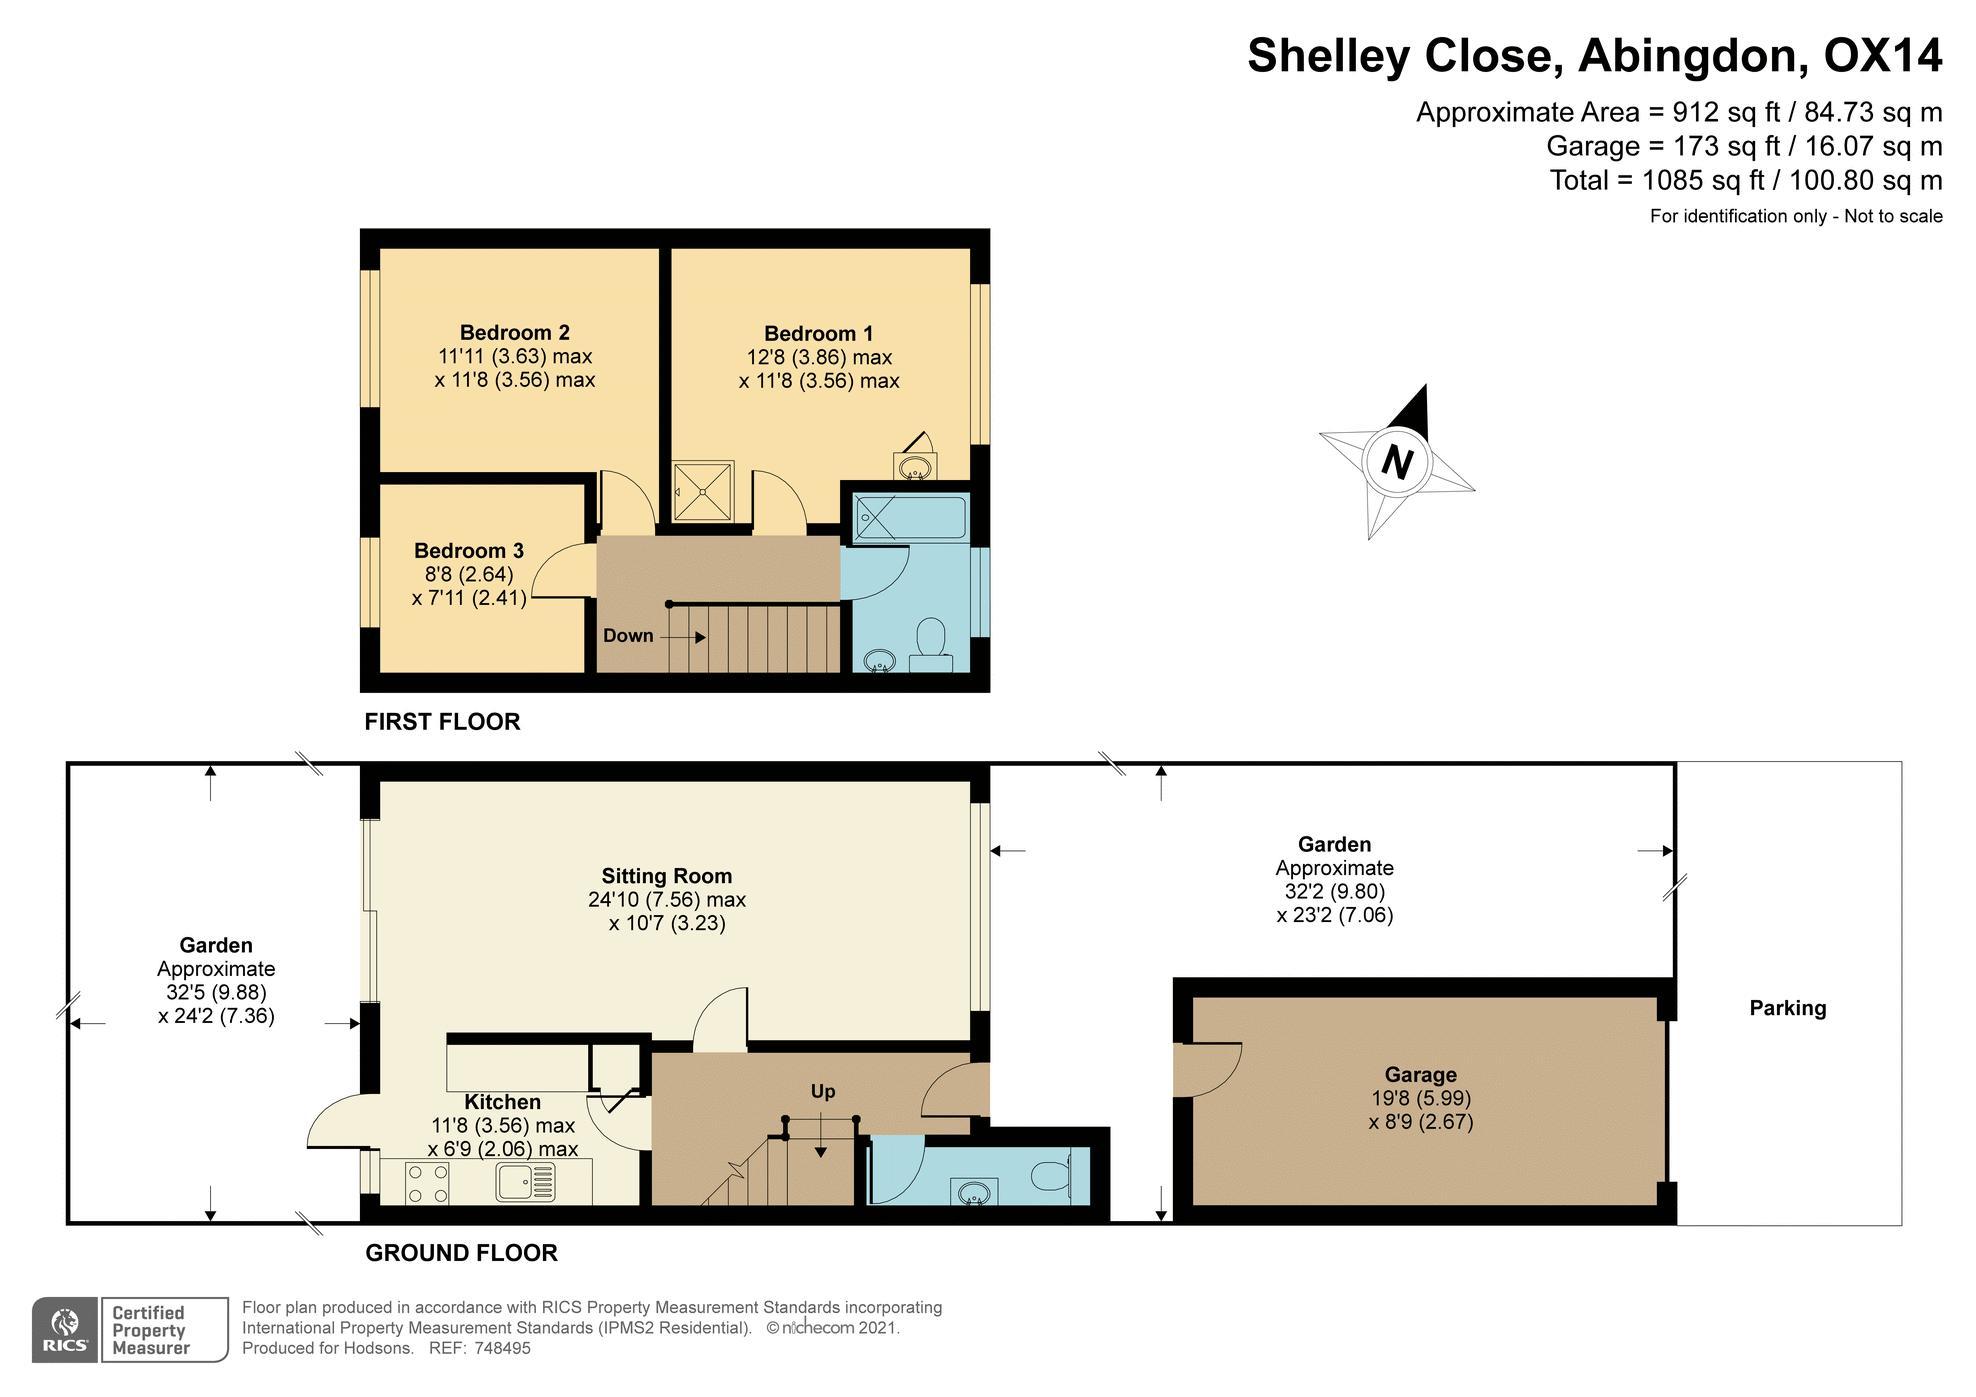 Shelley Close